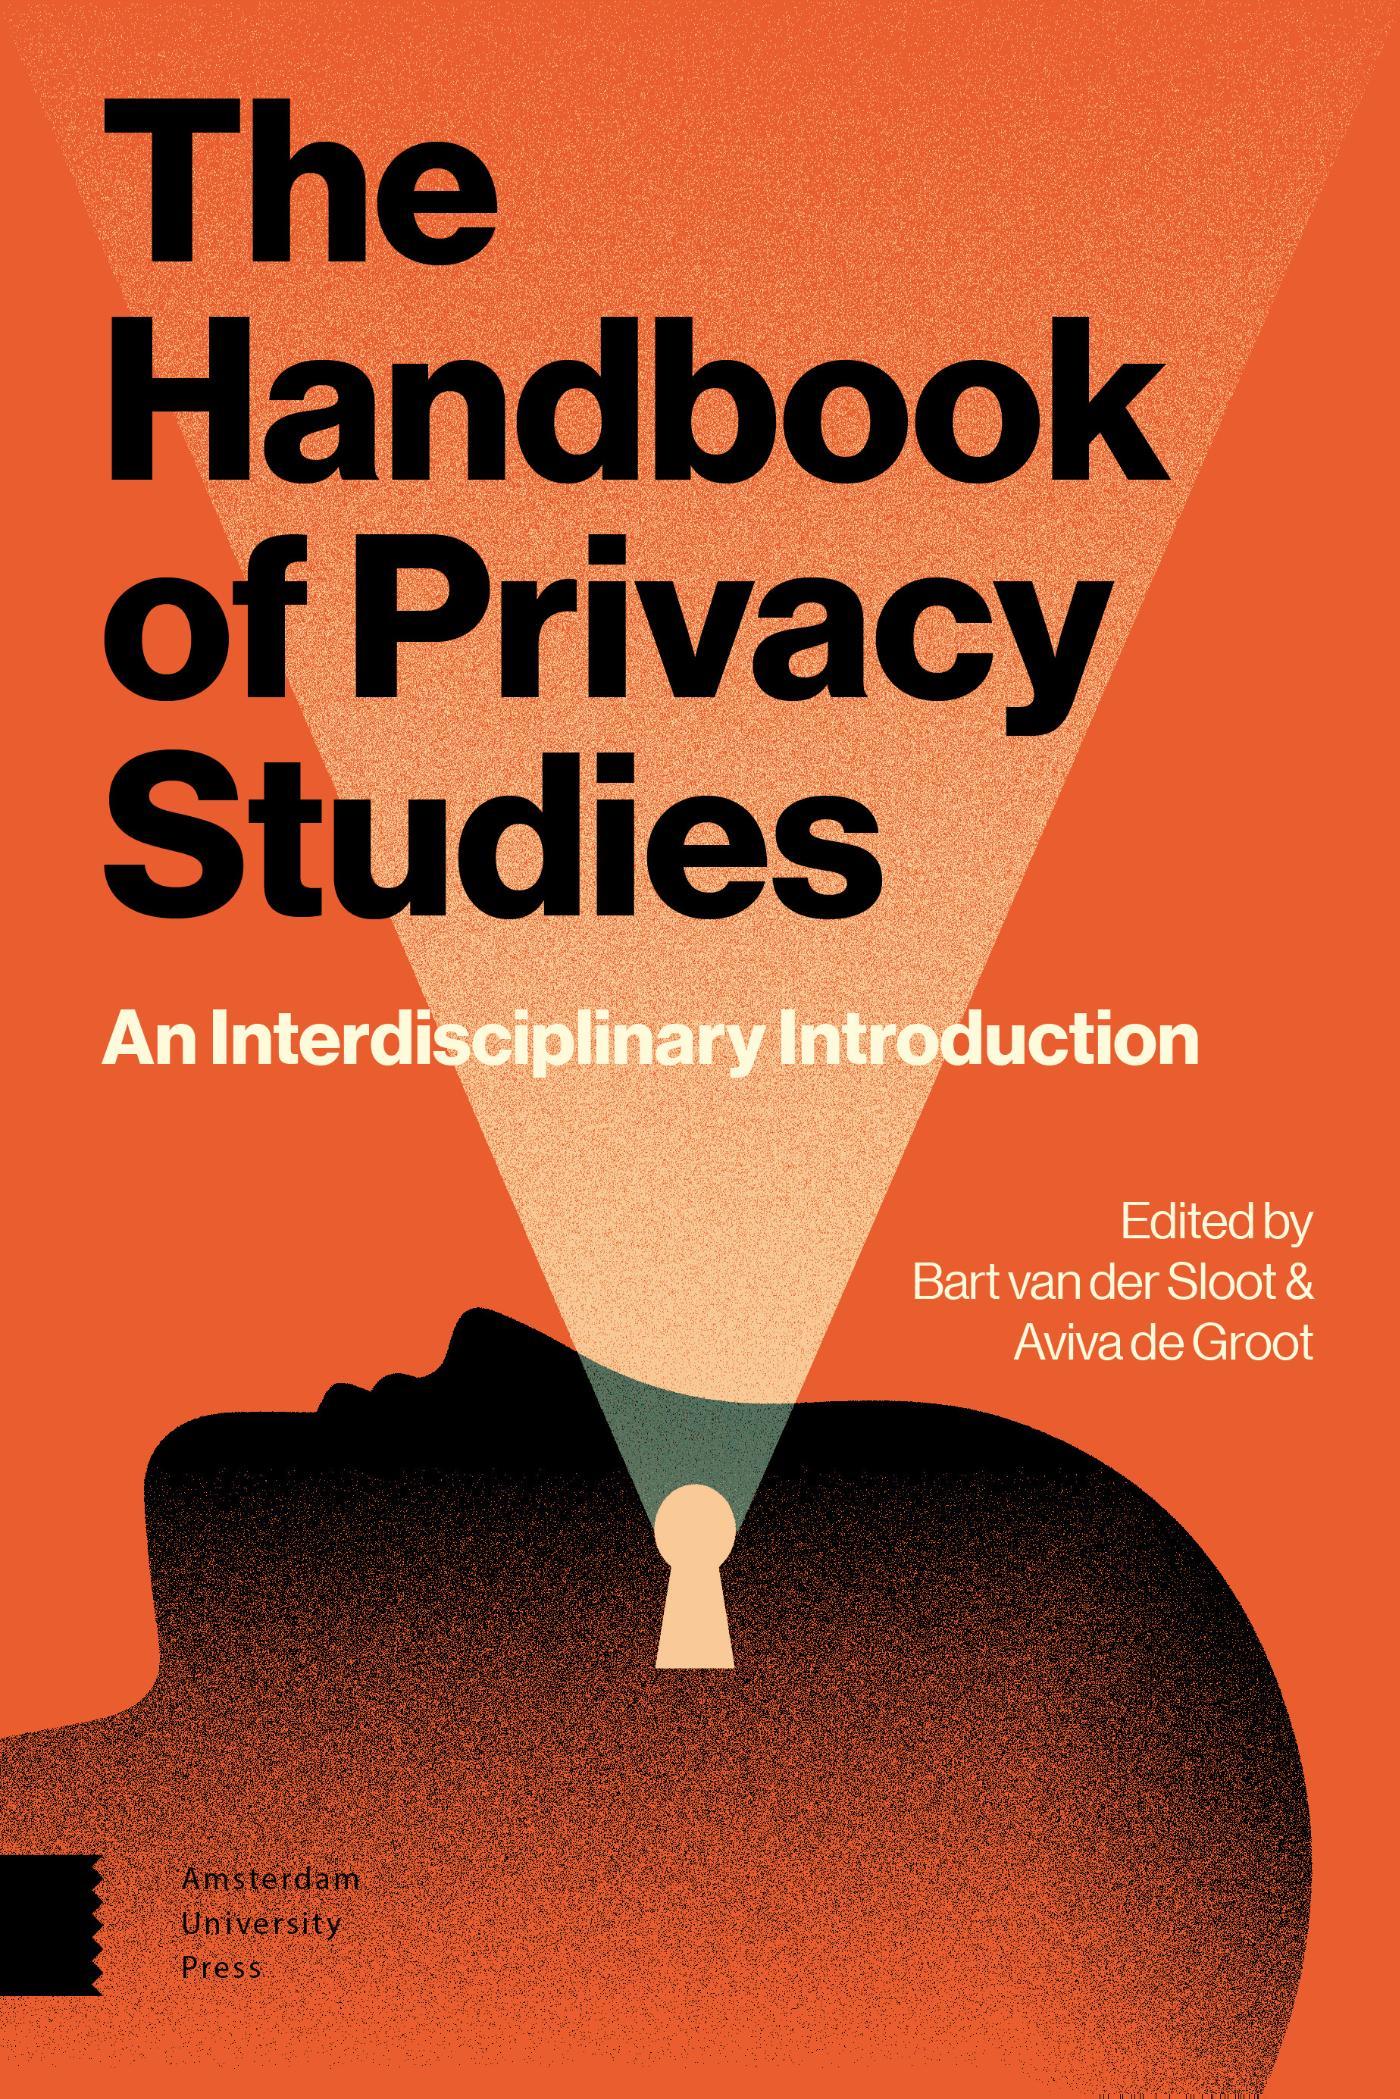 The Handbook of Privacy Studies